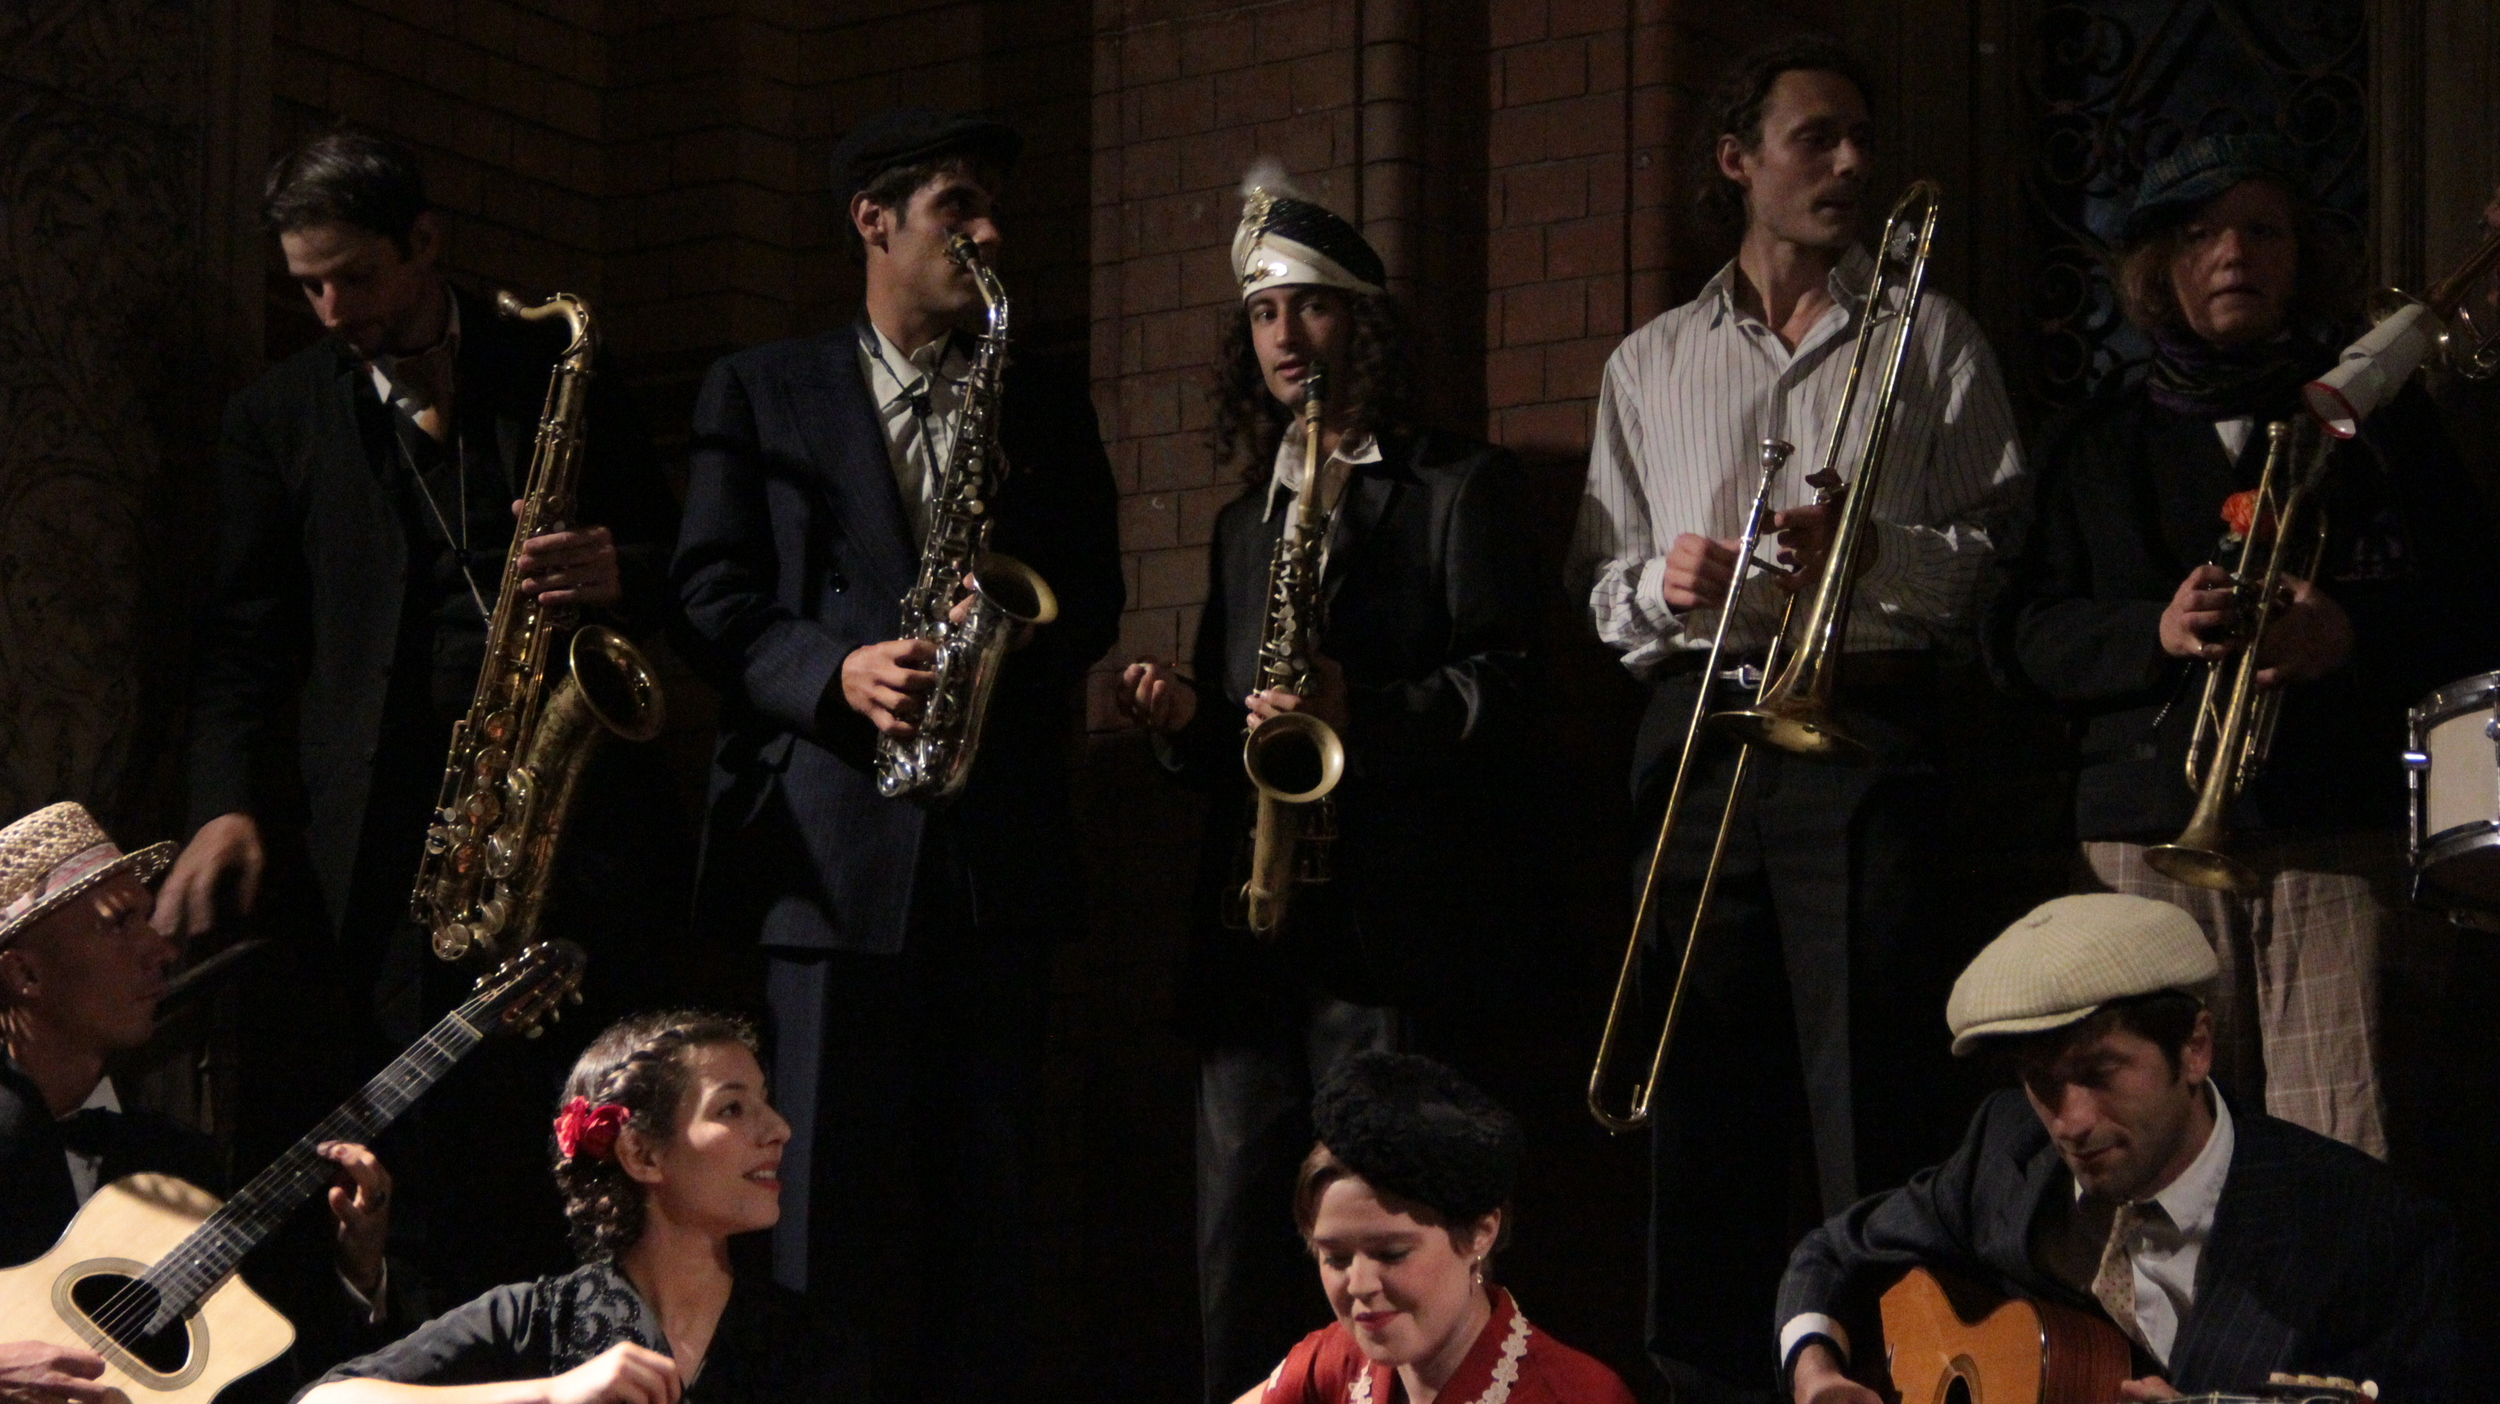 Djanovis Big Band with Tim Brosig, Daniel Duspiwa, Sufi Yan, Anton Wunderlich, Charlene Jean, Toni Tango